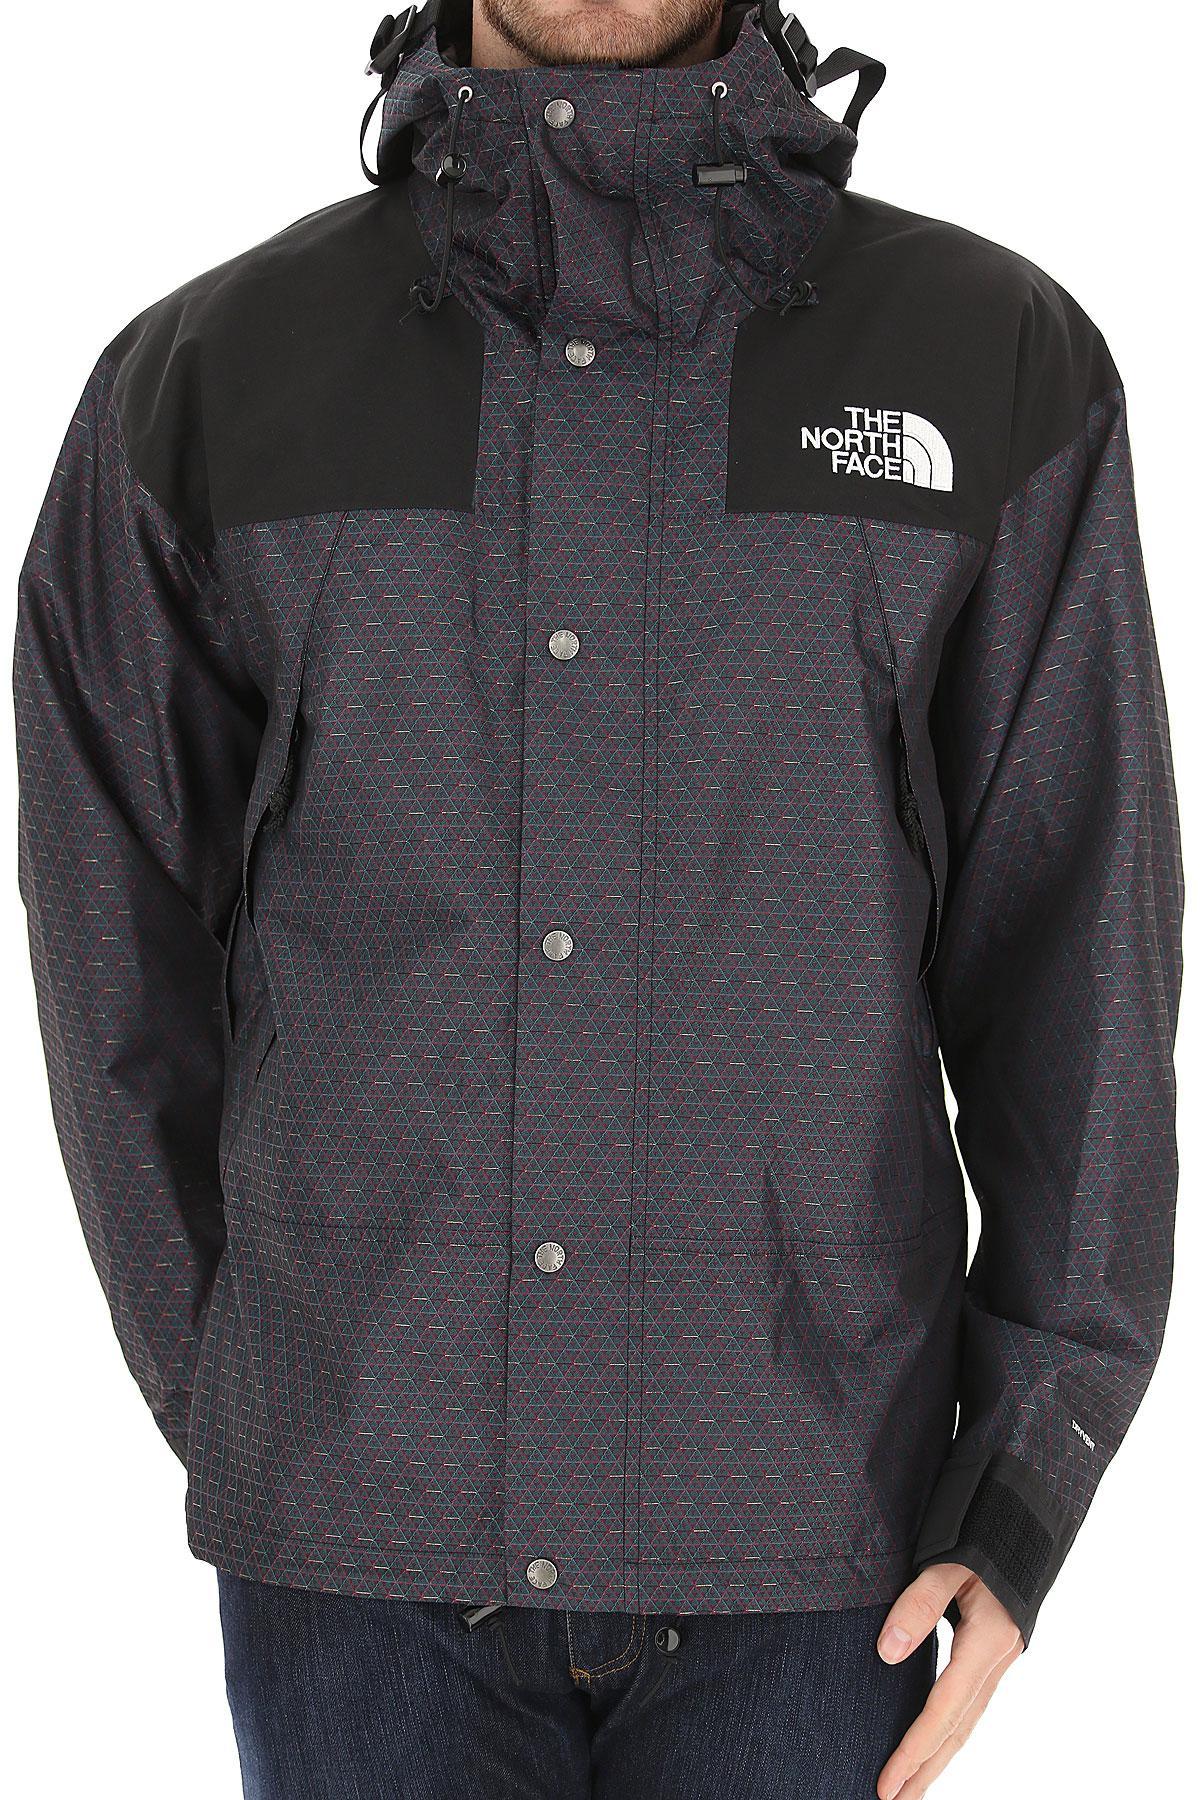 The North Face - Black Jacket For Men for Men - Lyst. View fullscreen 3e8bcd942